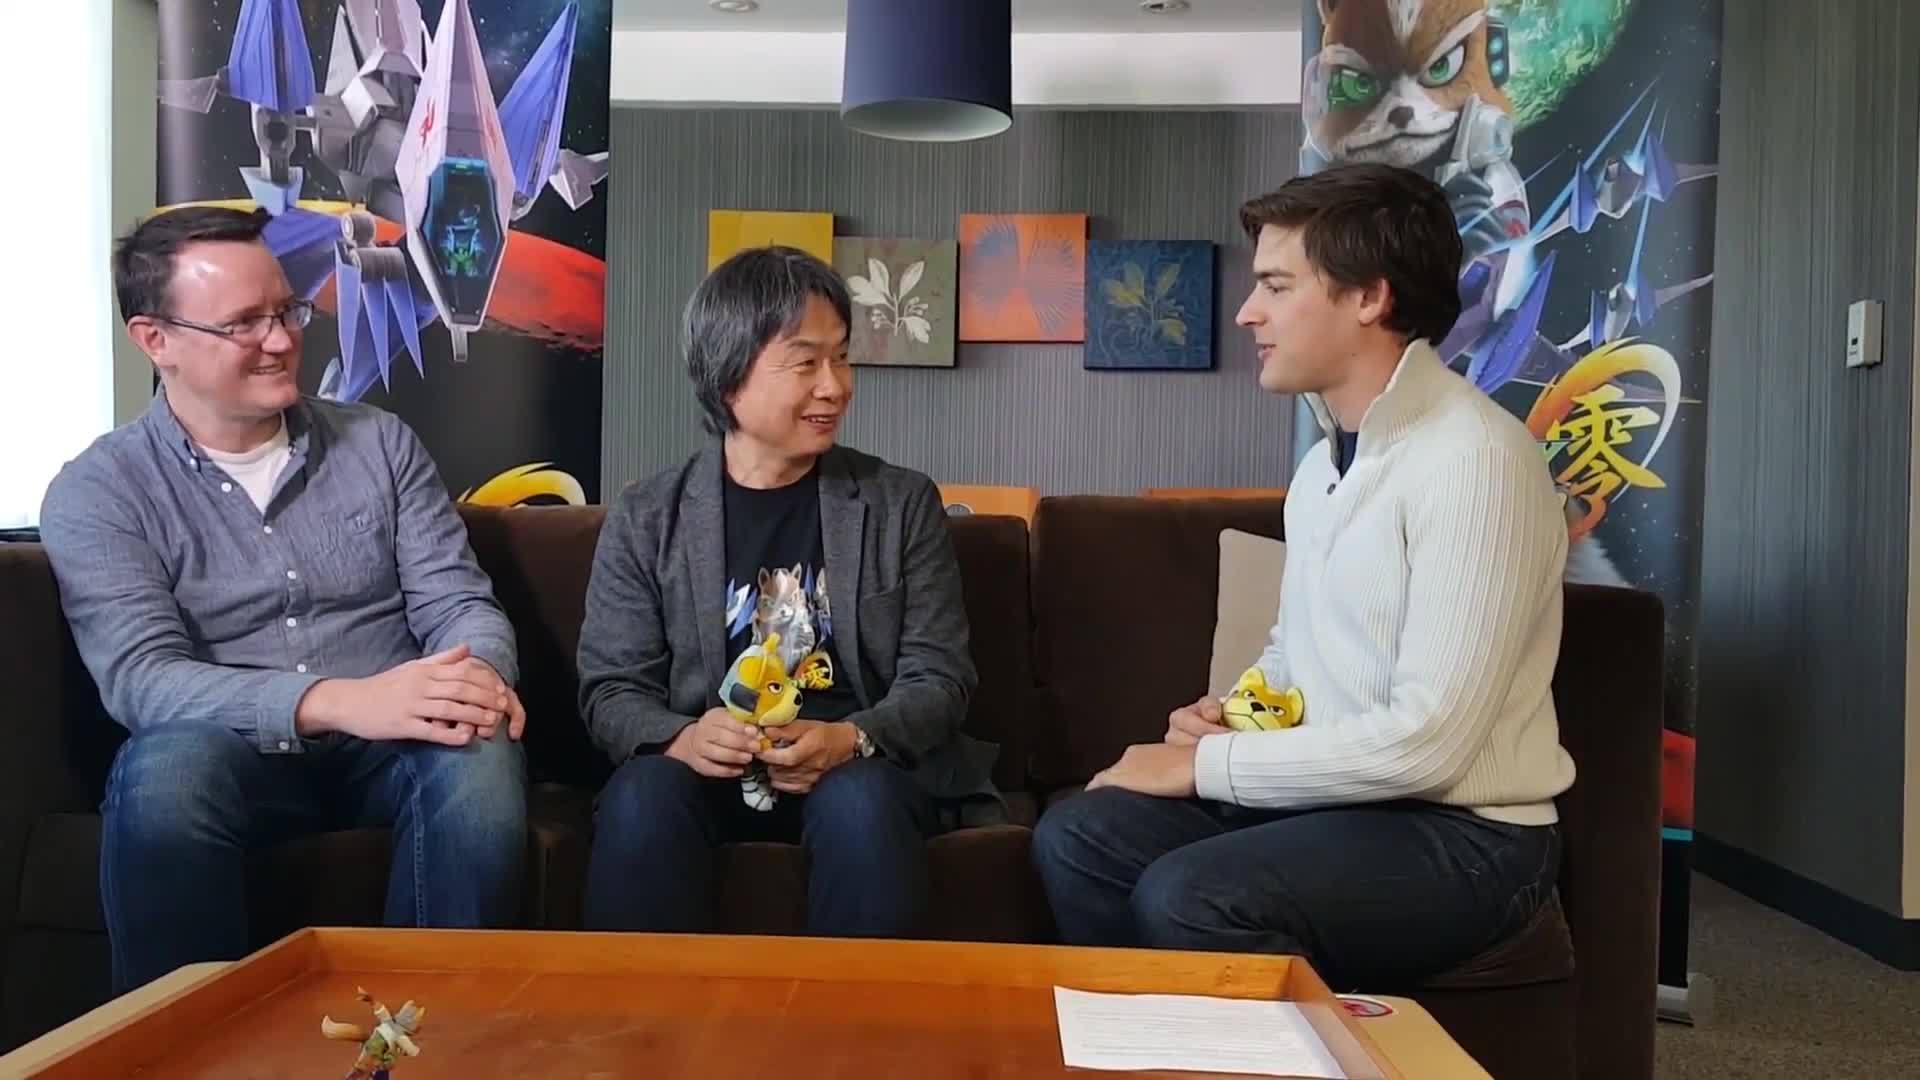 cringepics, star fox 64, start fox zero, Shigeru miyamoto denied high five GIFs